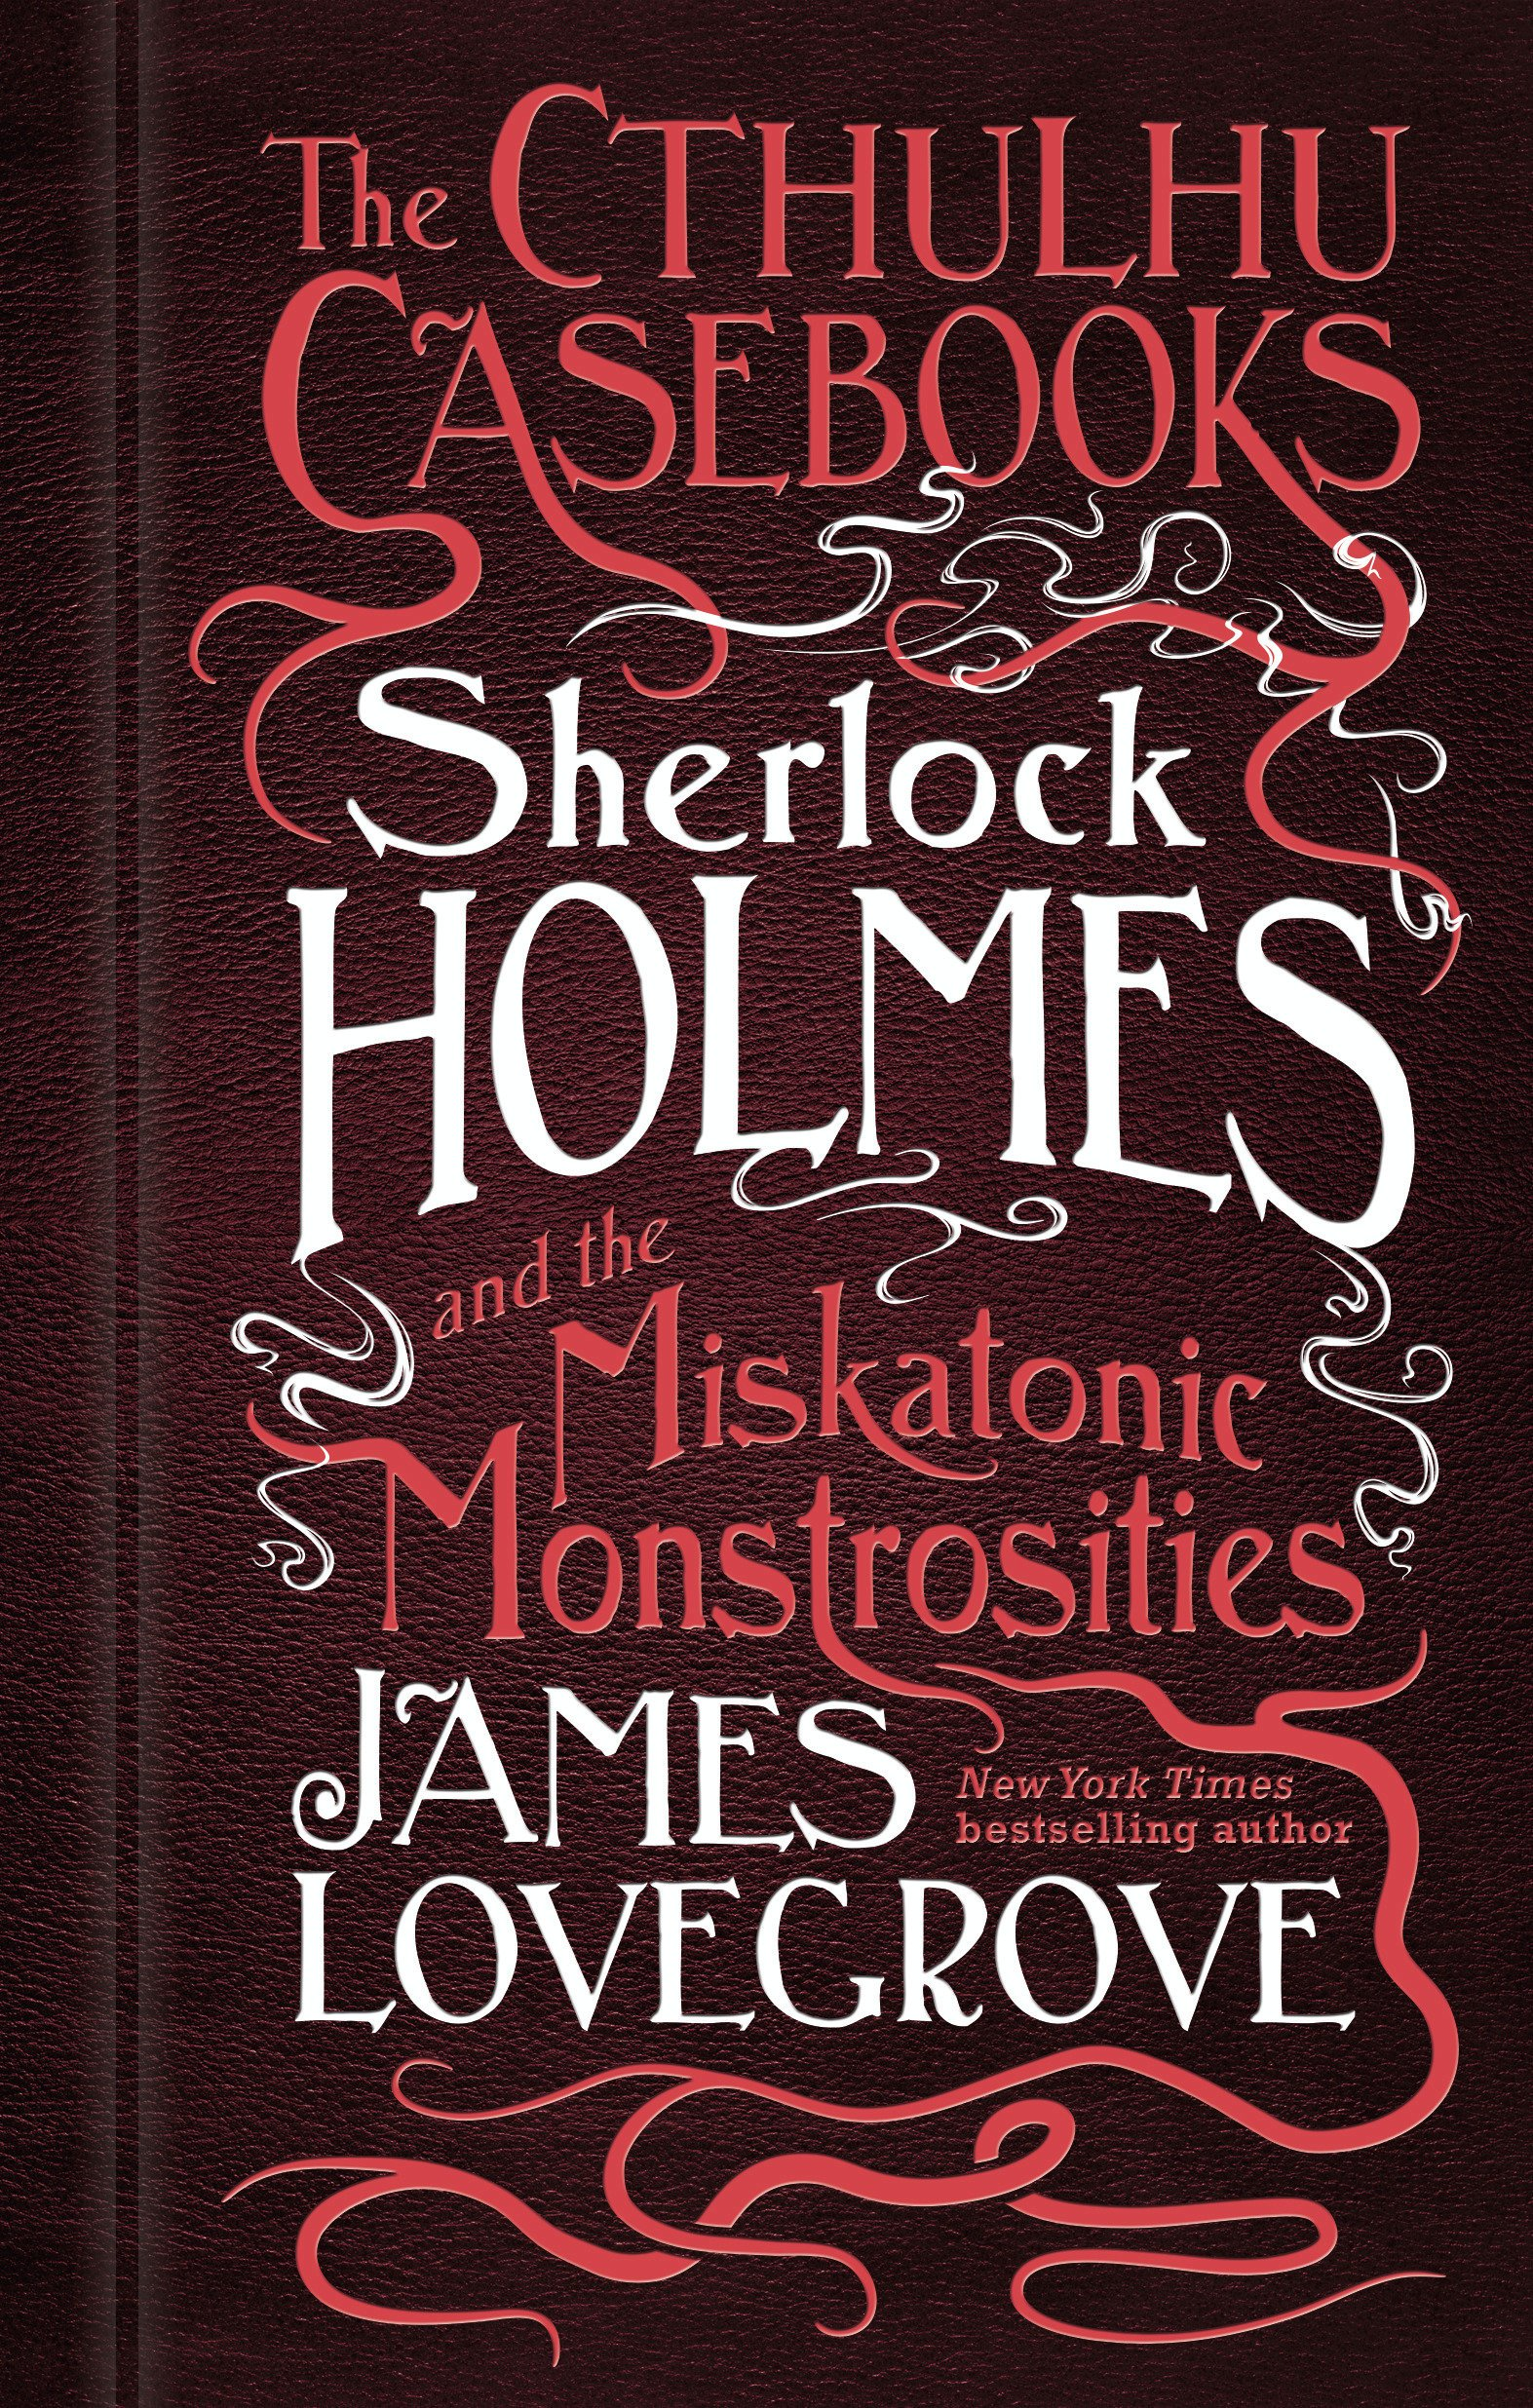 Read Online The Cthulhu Casebooks - Sherlock Holmes and the Miskatonic Monstrosities pdf epub